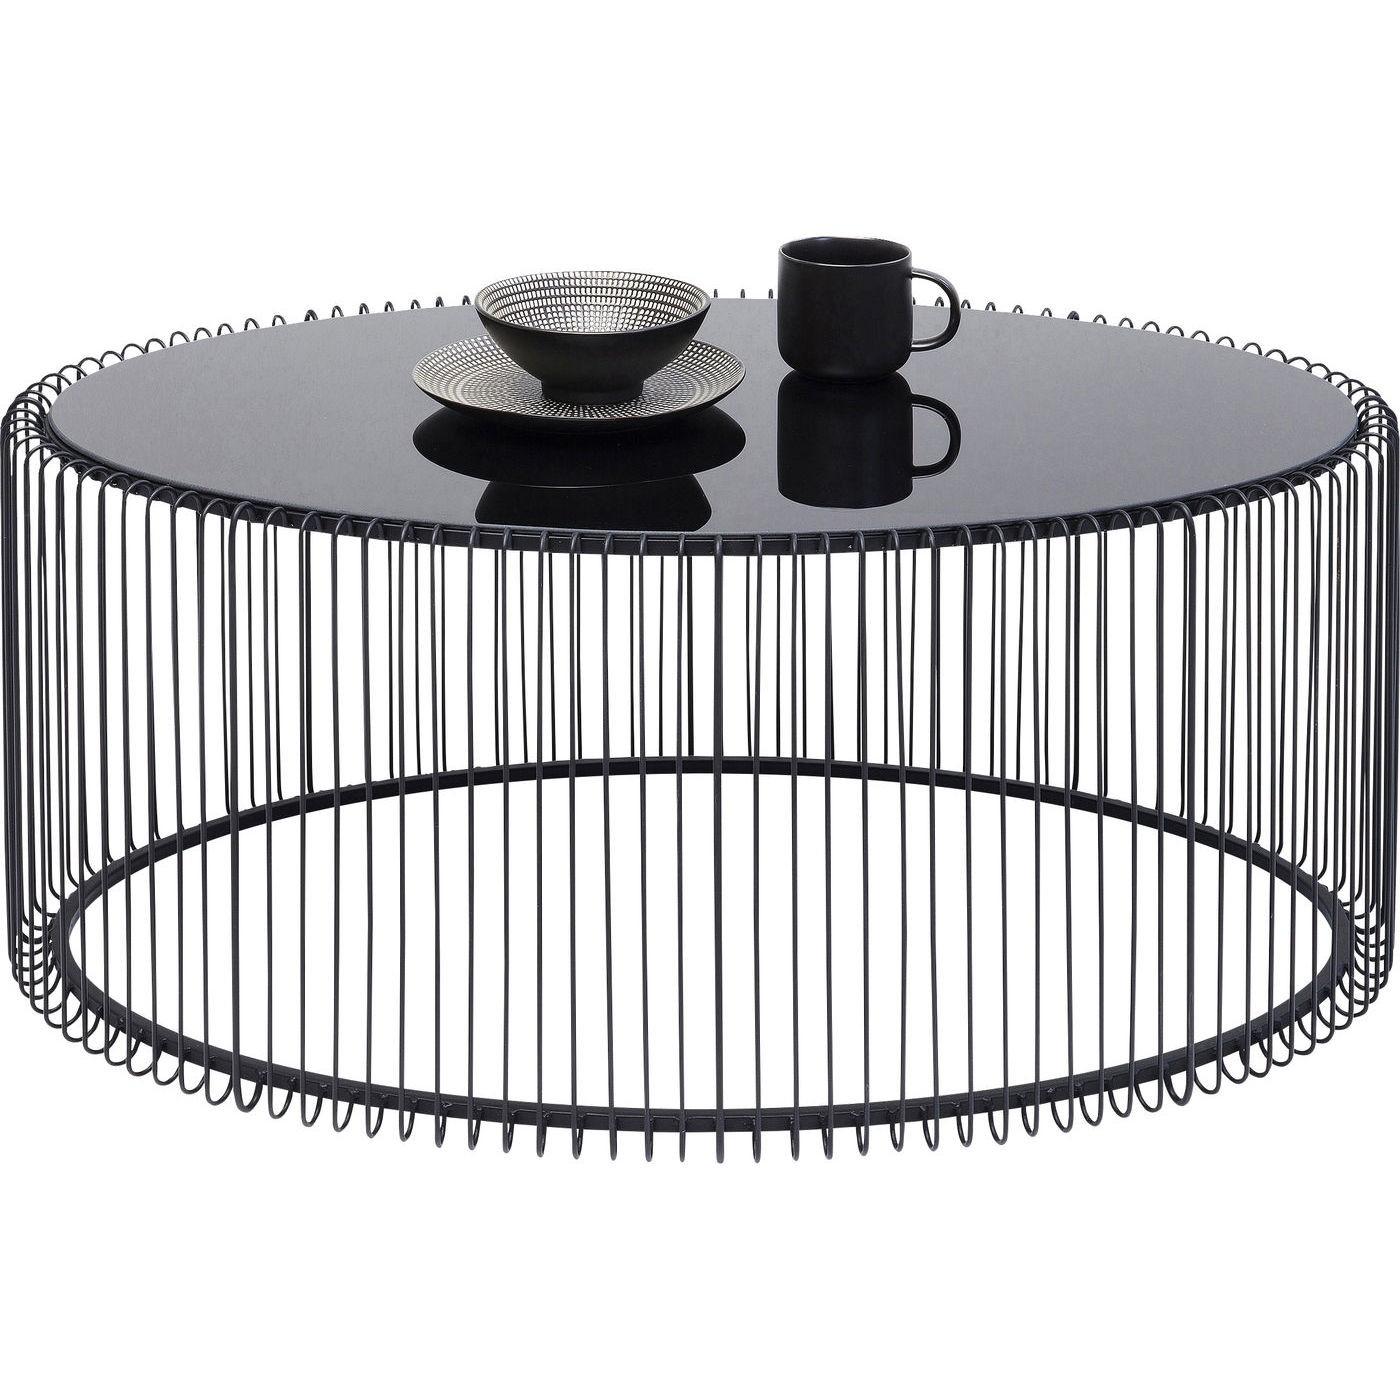 Table basse ovale Wire 60x90cm noire Kare Design